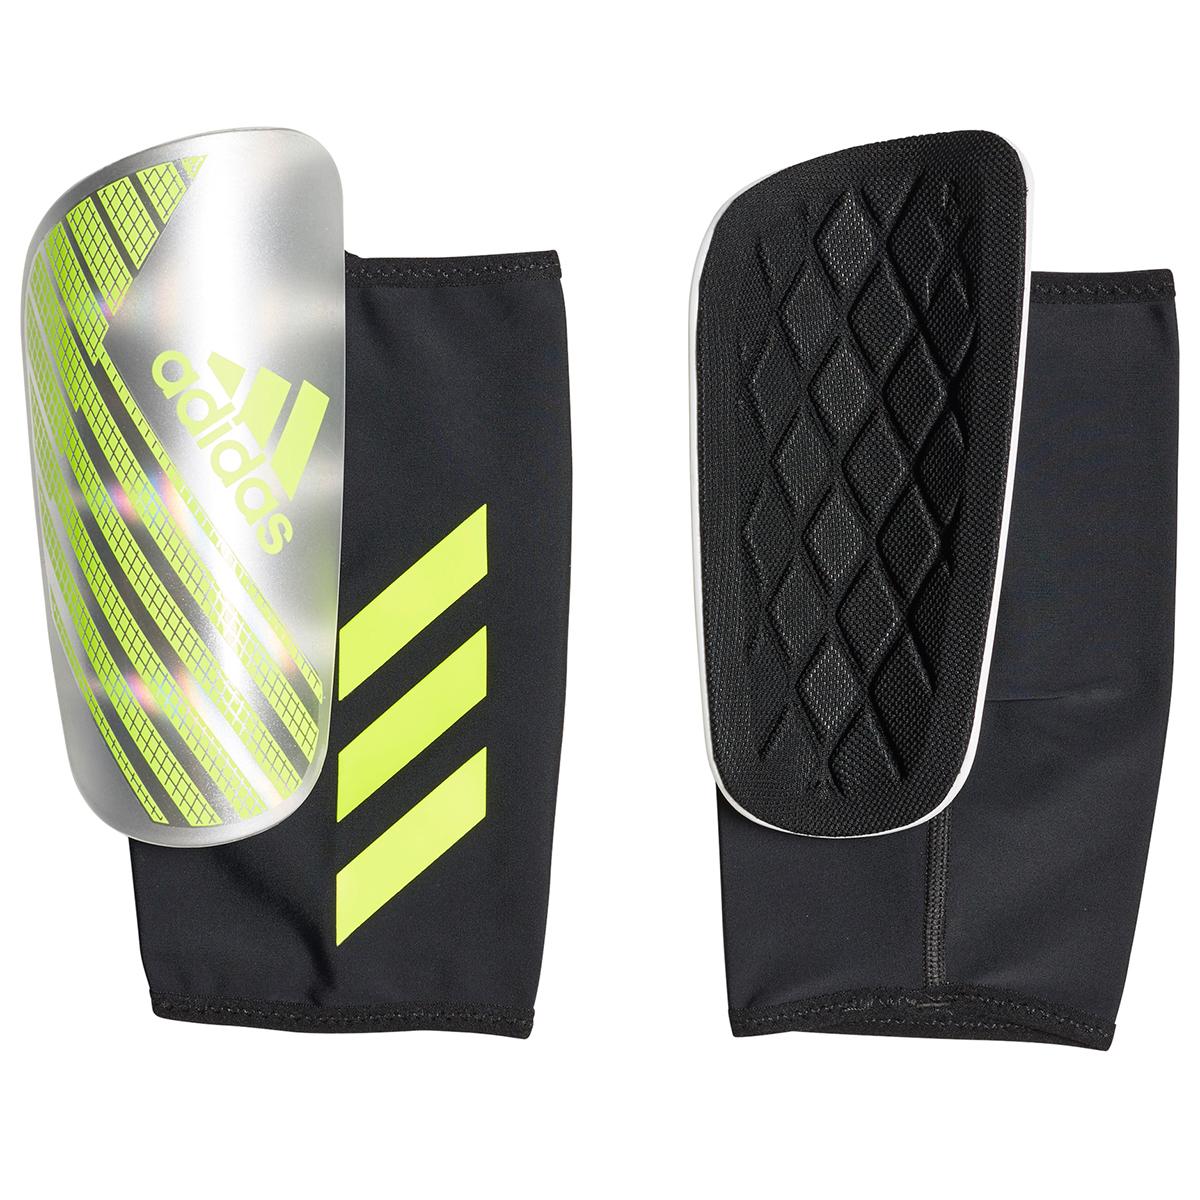 Adidas X Pro Shin Guards - Black, L